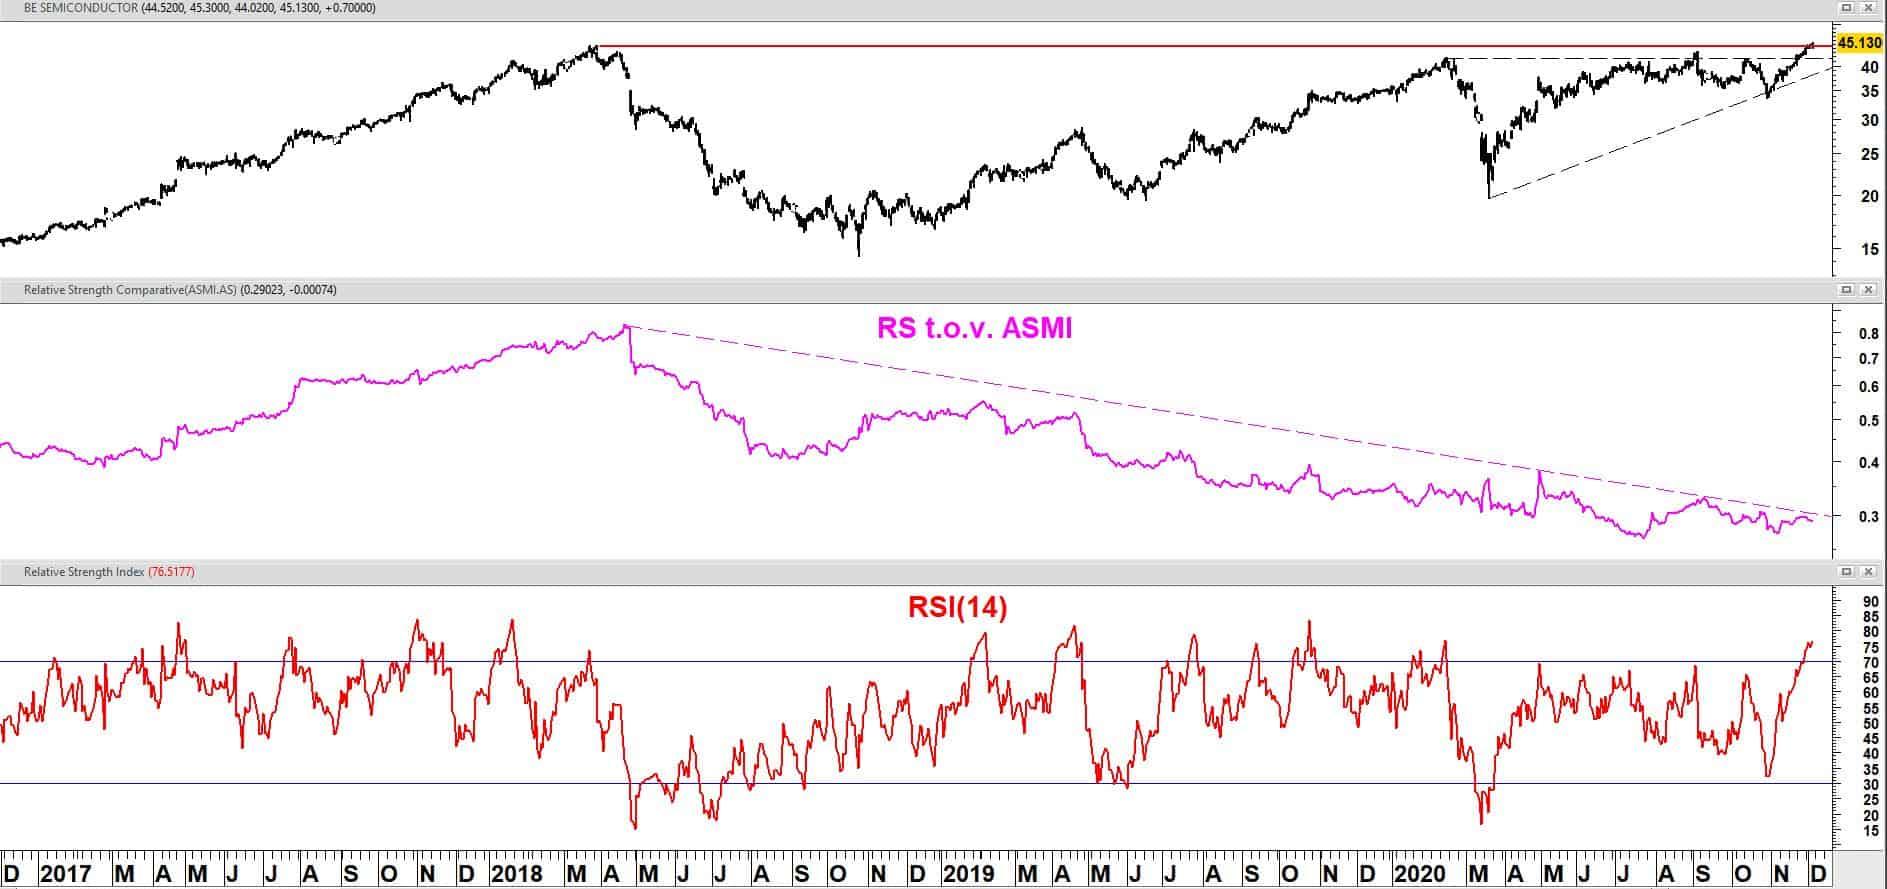 BE Semiconductor Industries vanaf december 2016 + relatieve sterkte t.o.v. ASMI + RSI(14)